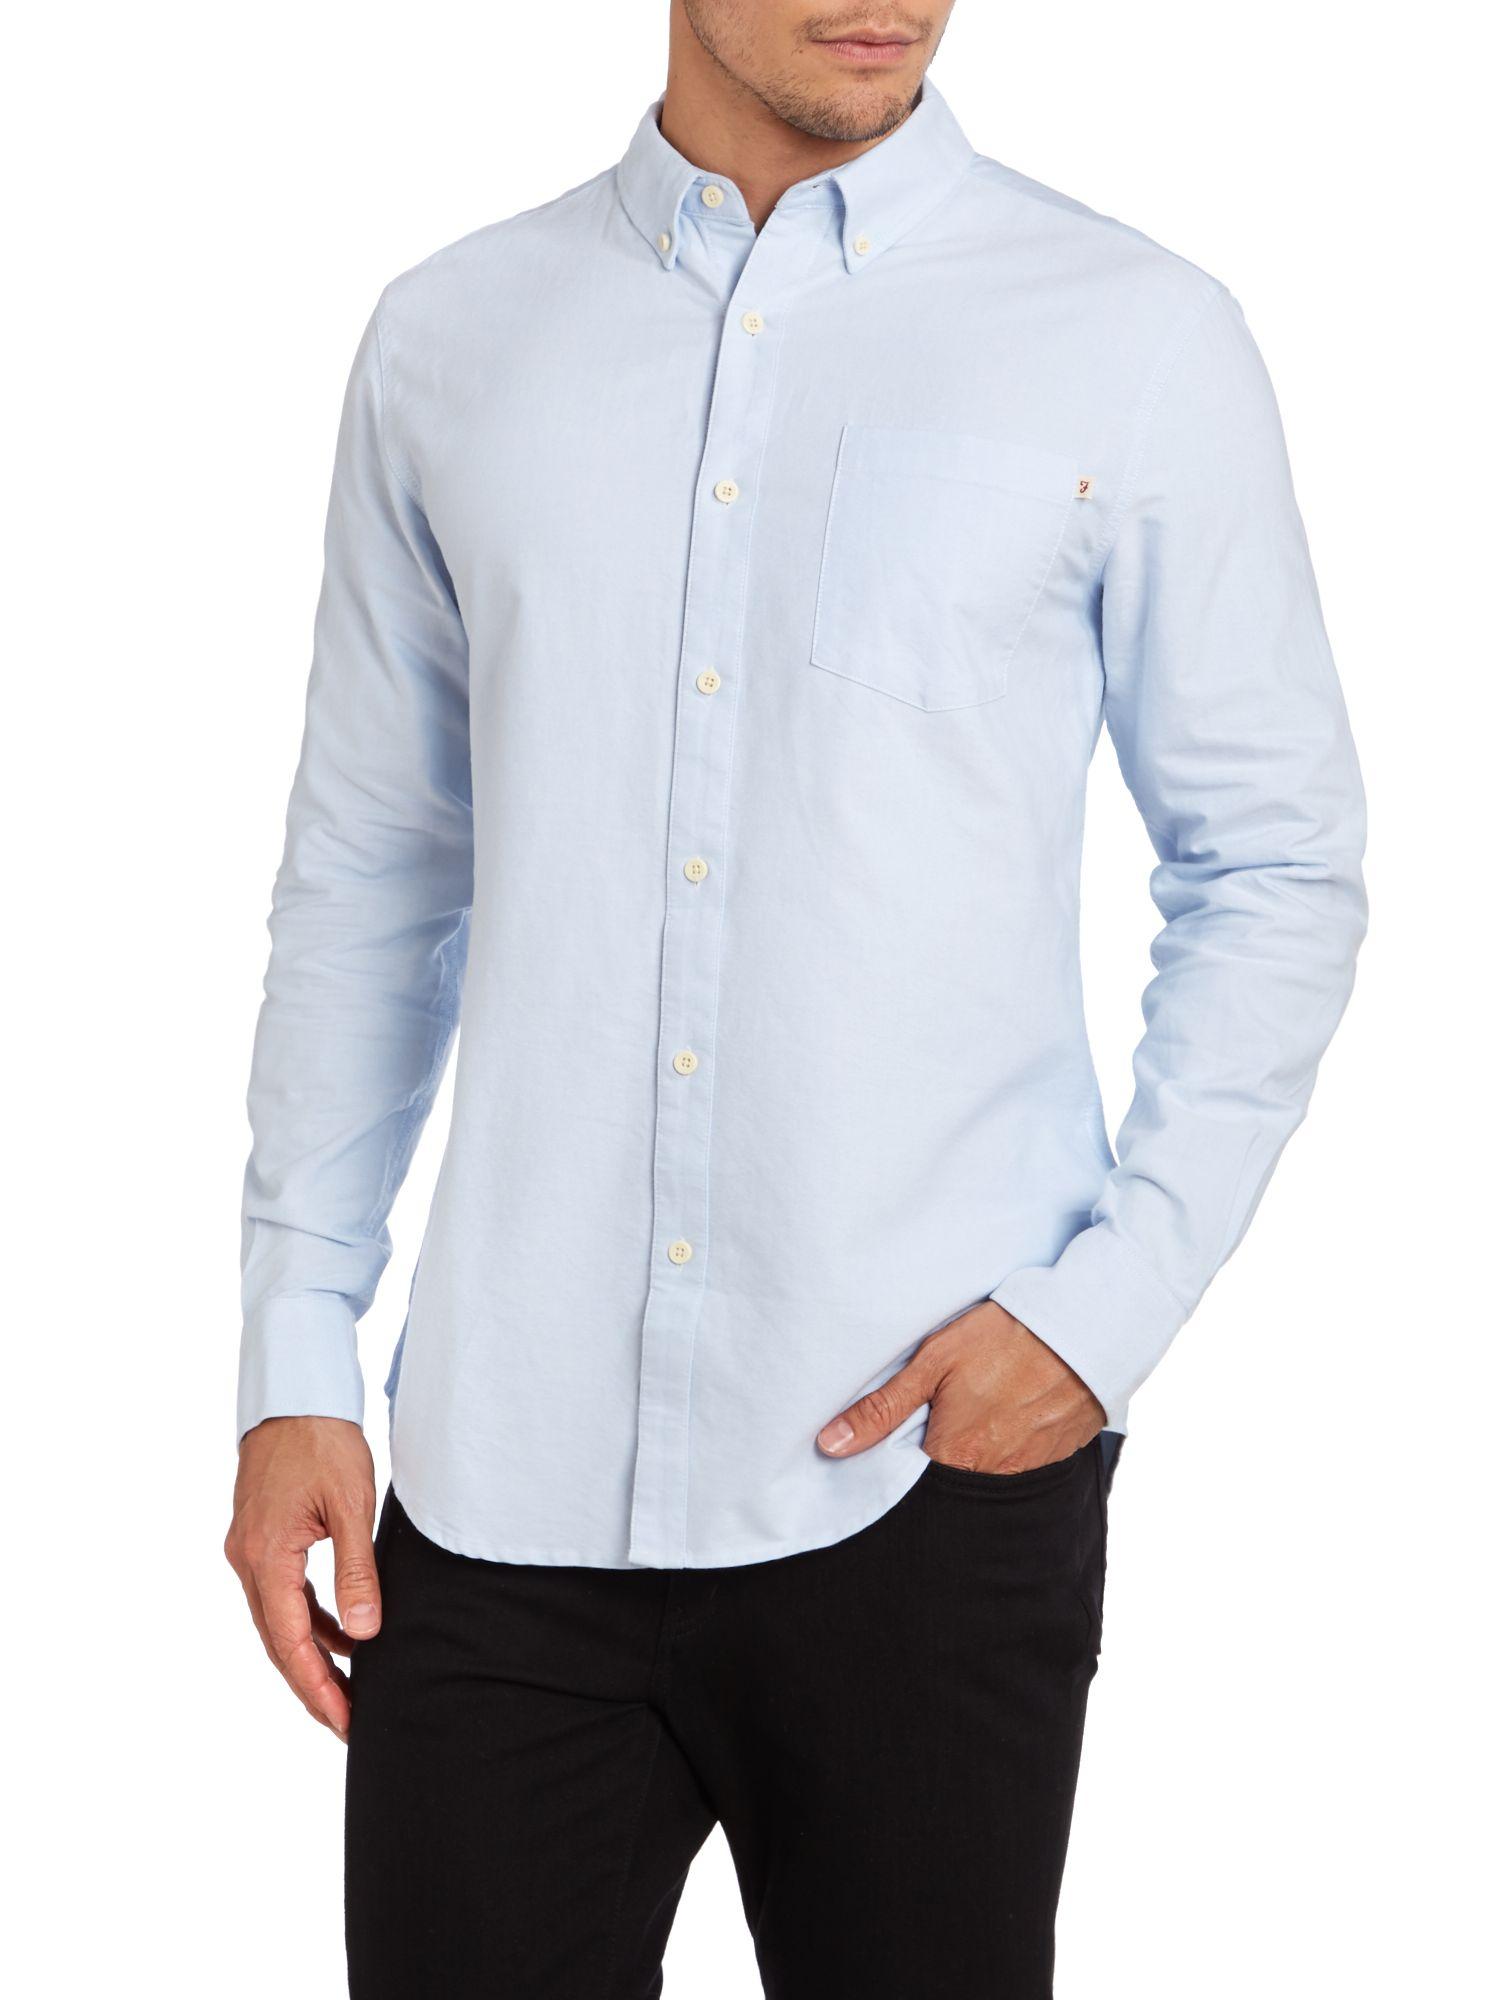 Farah one pocket oxford shirt in blue for men lyst for Mens blue oxford shirt